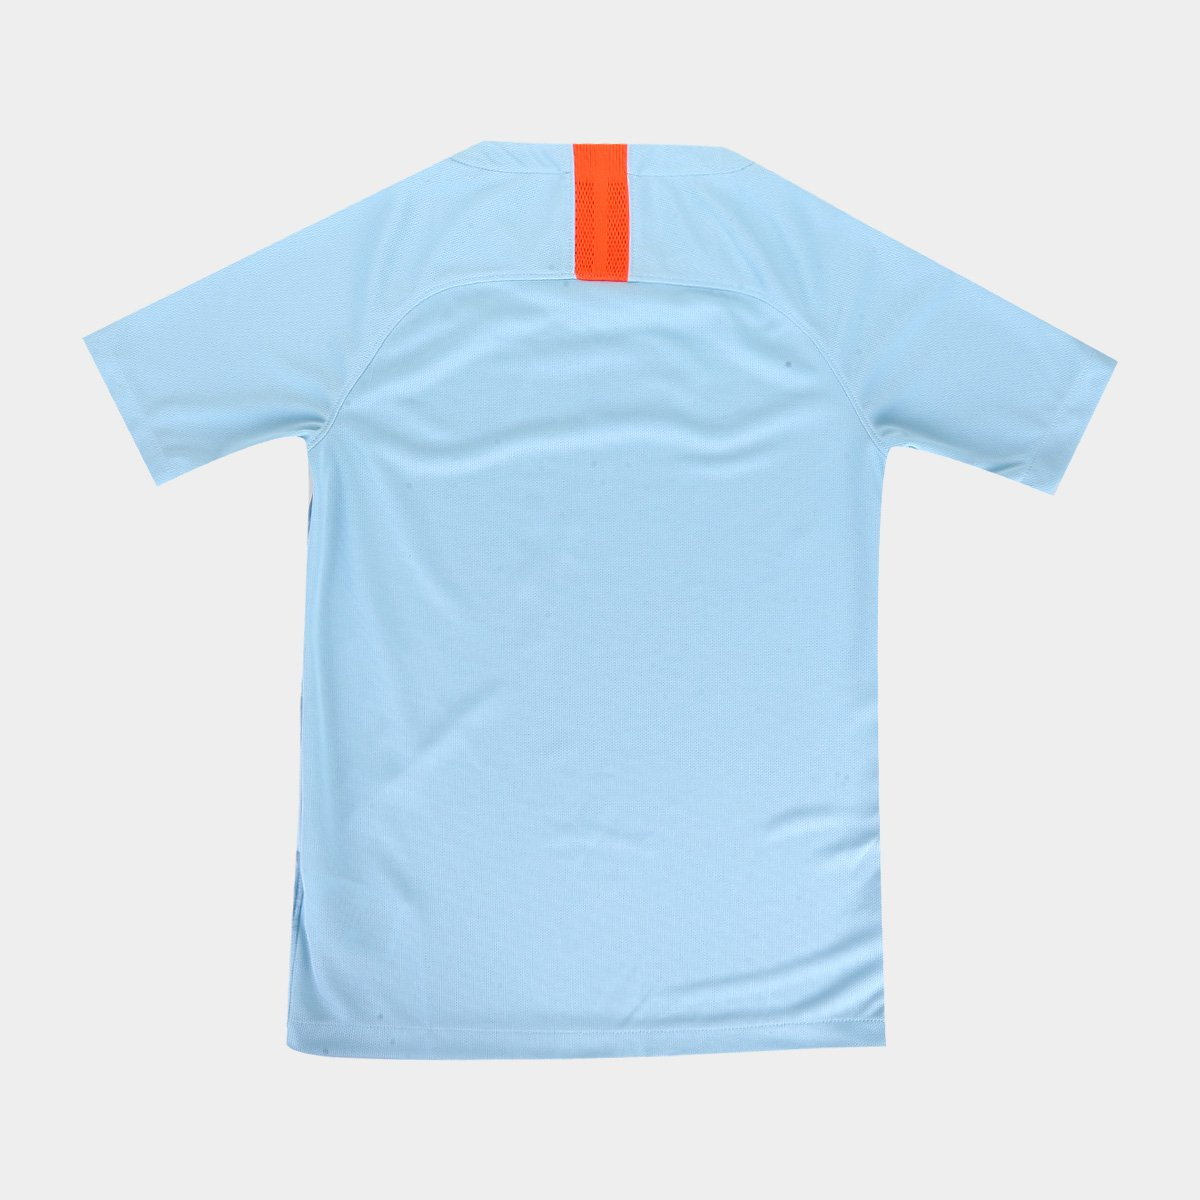 Camisa Chelsea Infantil Third 2018 s n° - Torcedor Nike - Compre ... 7aeb2422f69b3